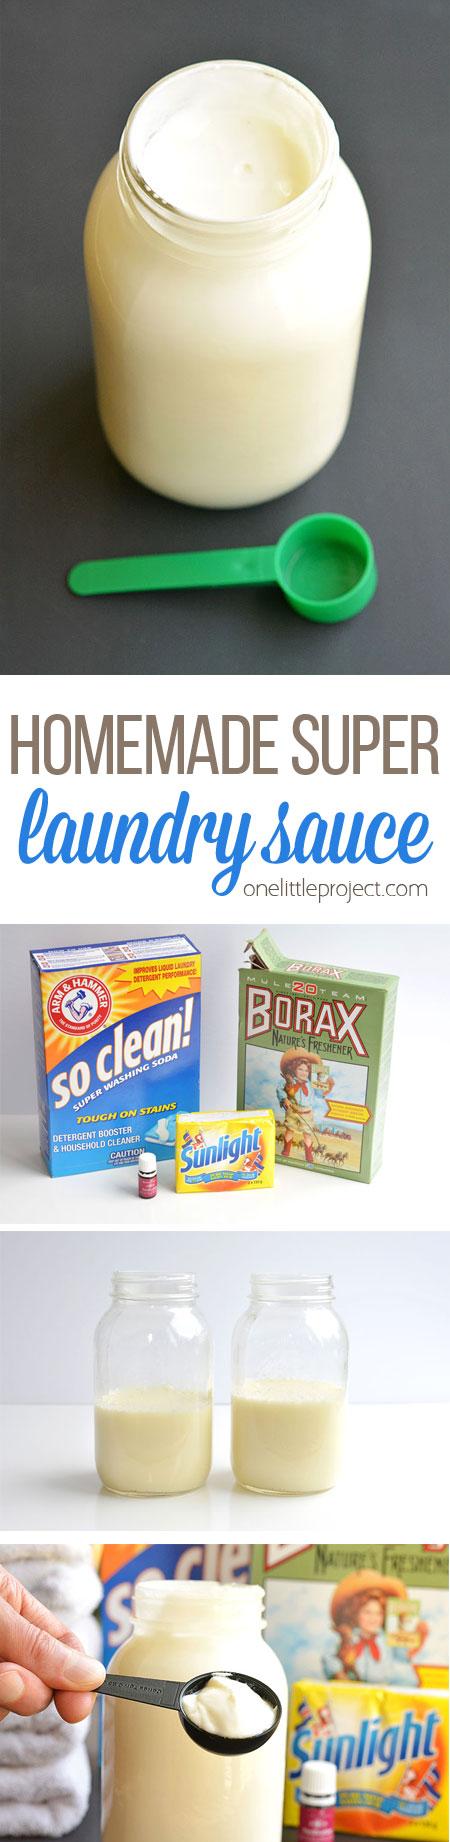 homemade super laundry sauce